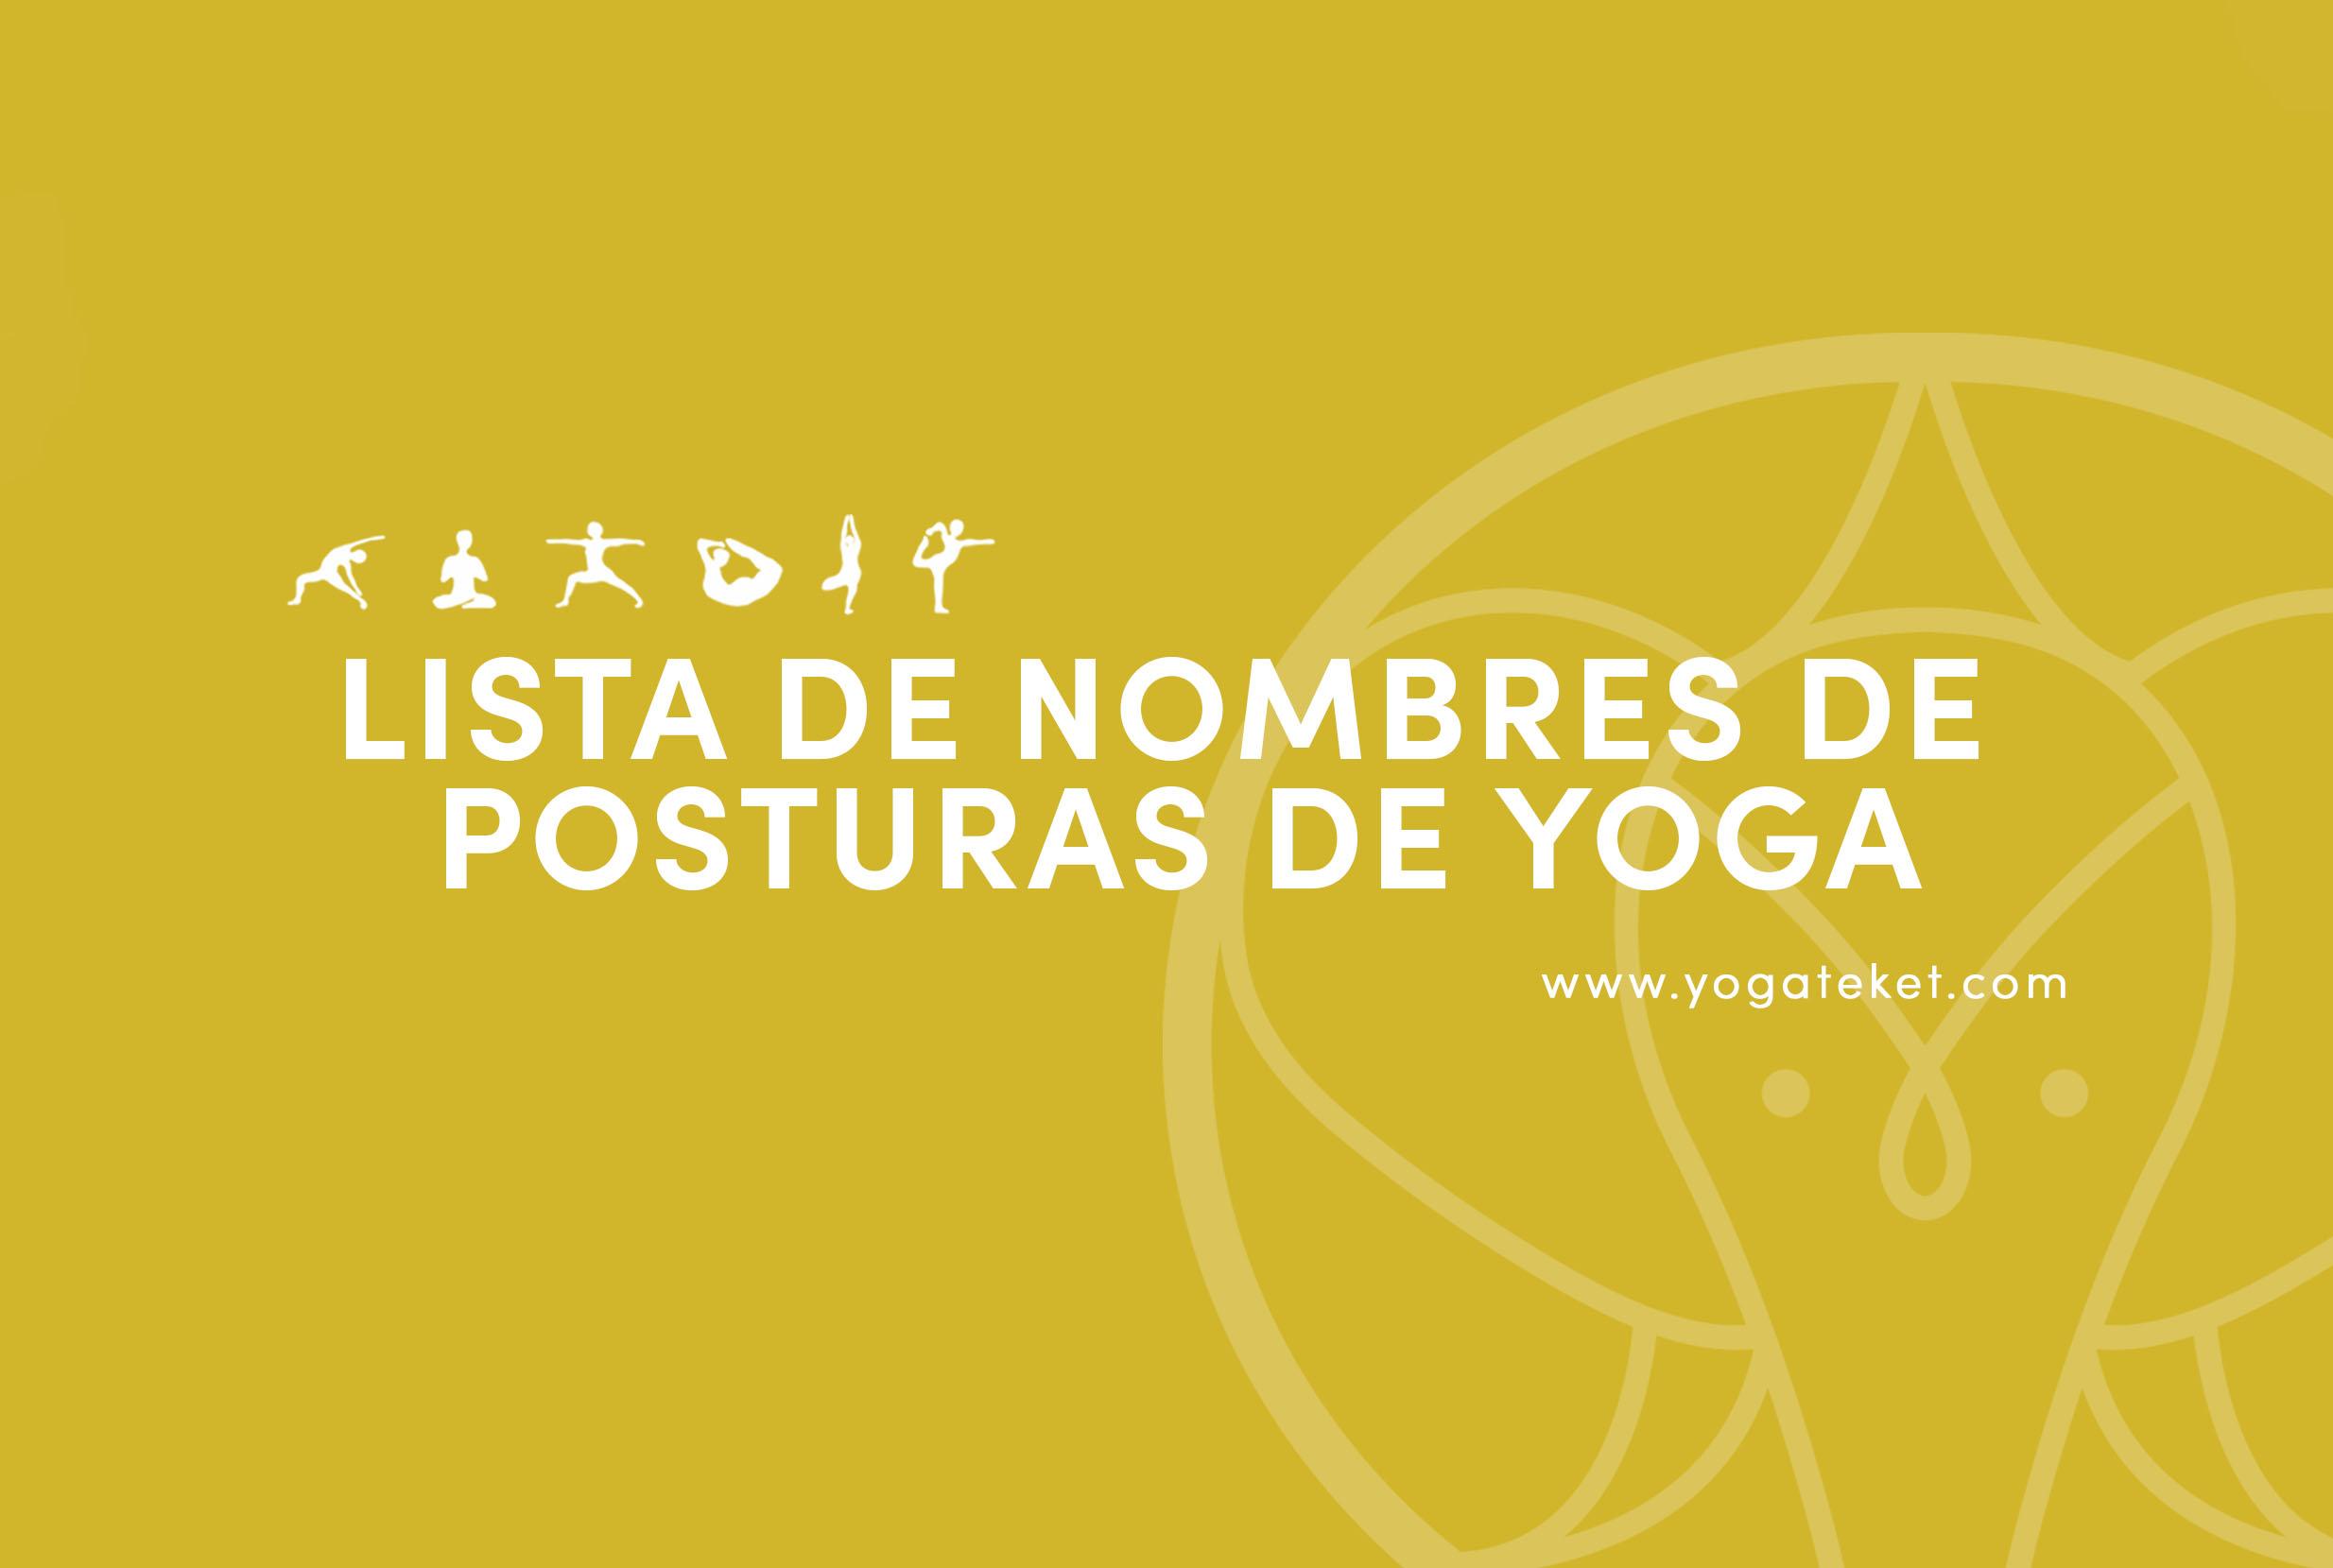 Lista de Nombres de Posturas de Yoga